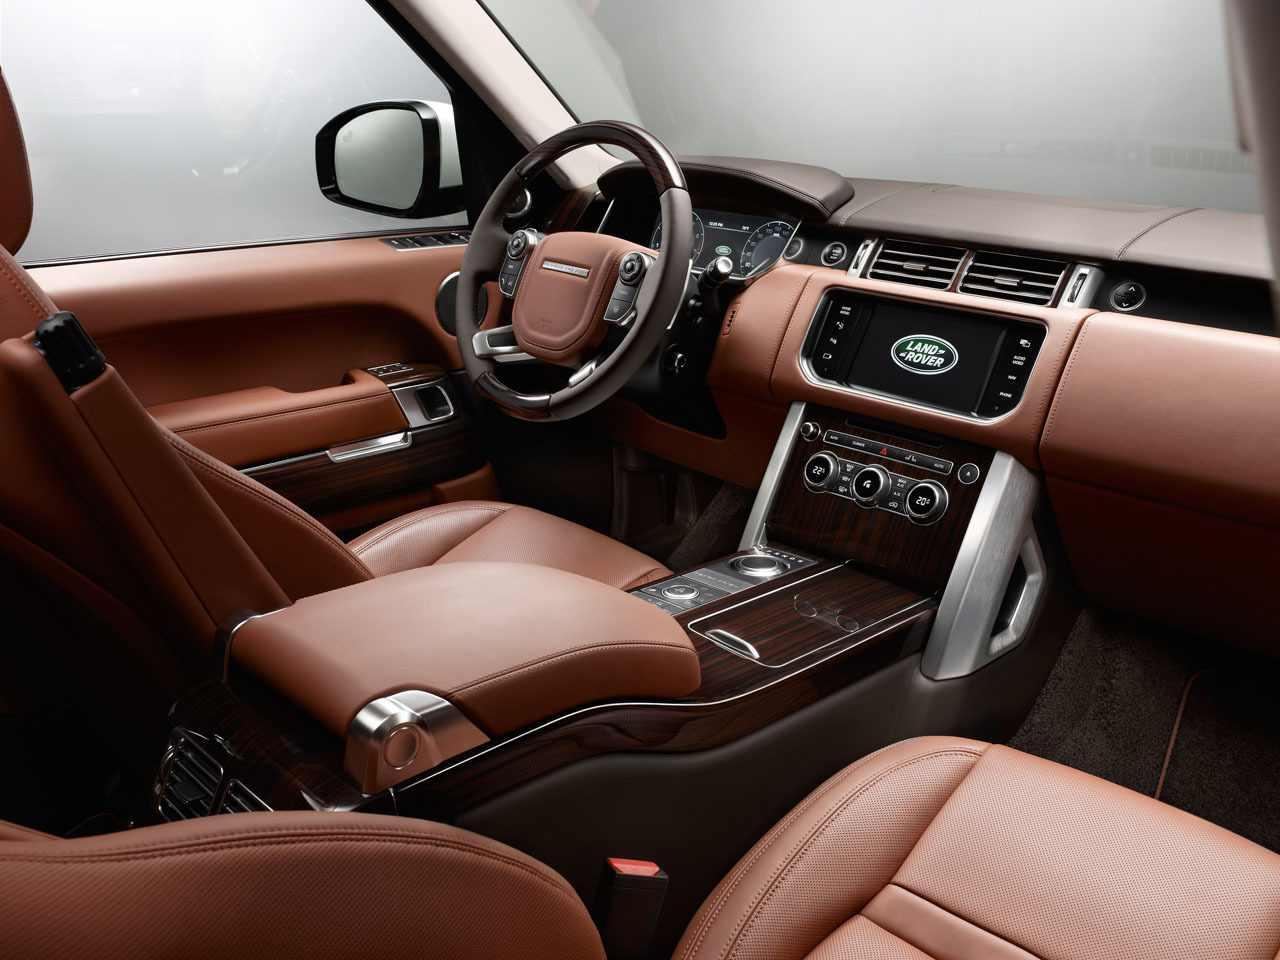 Range Rover Sport Interior 1080p Wallpapers Hd Wallpapers Wide